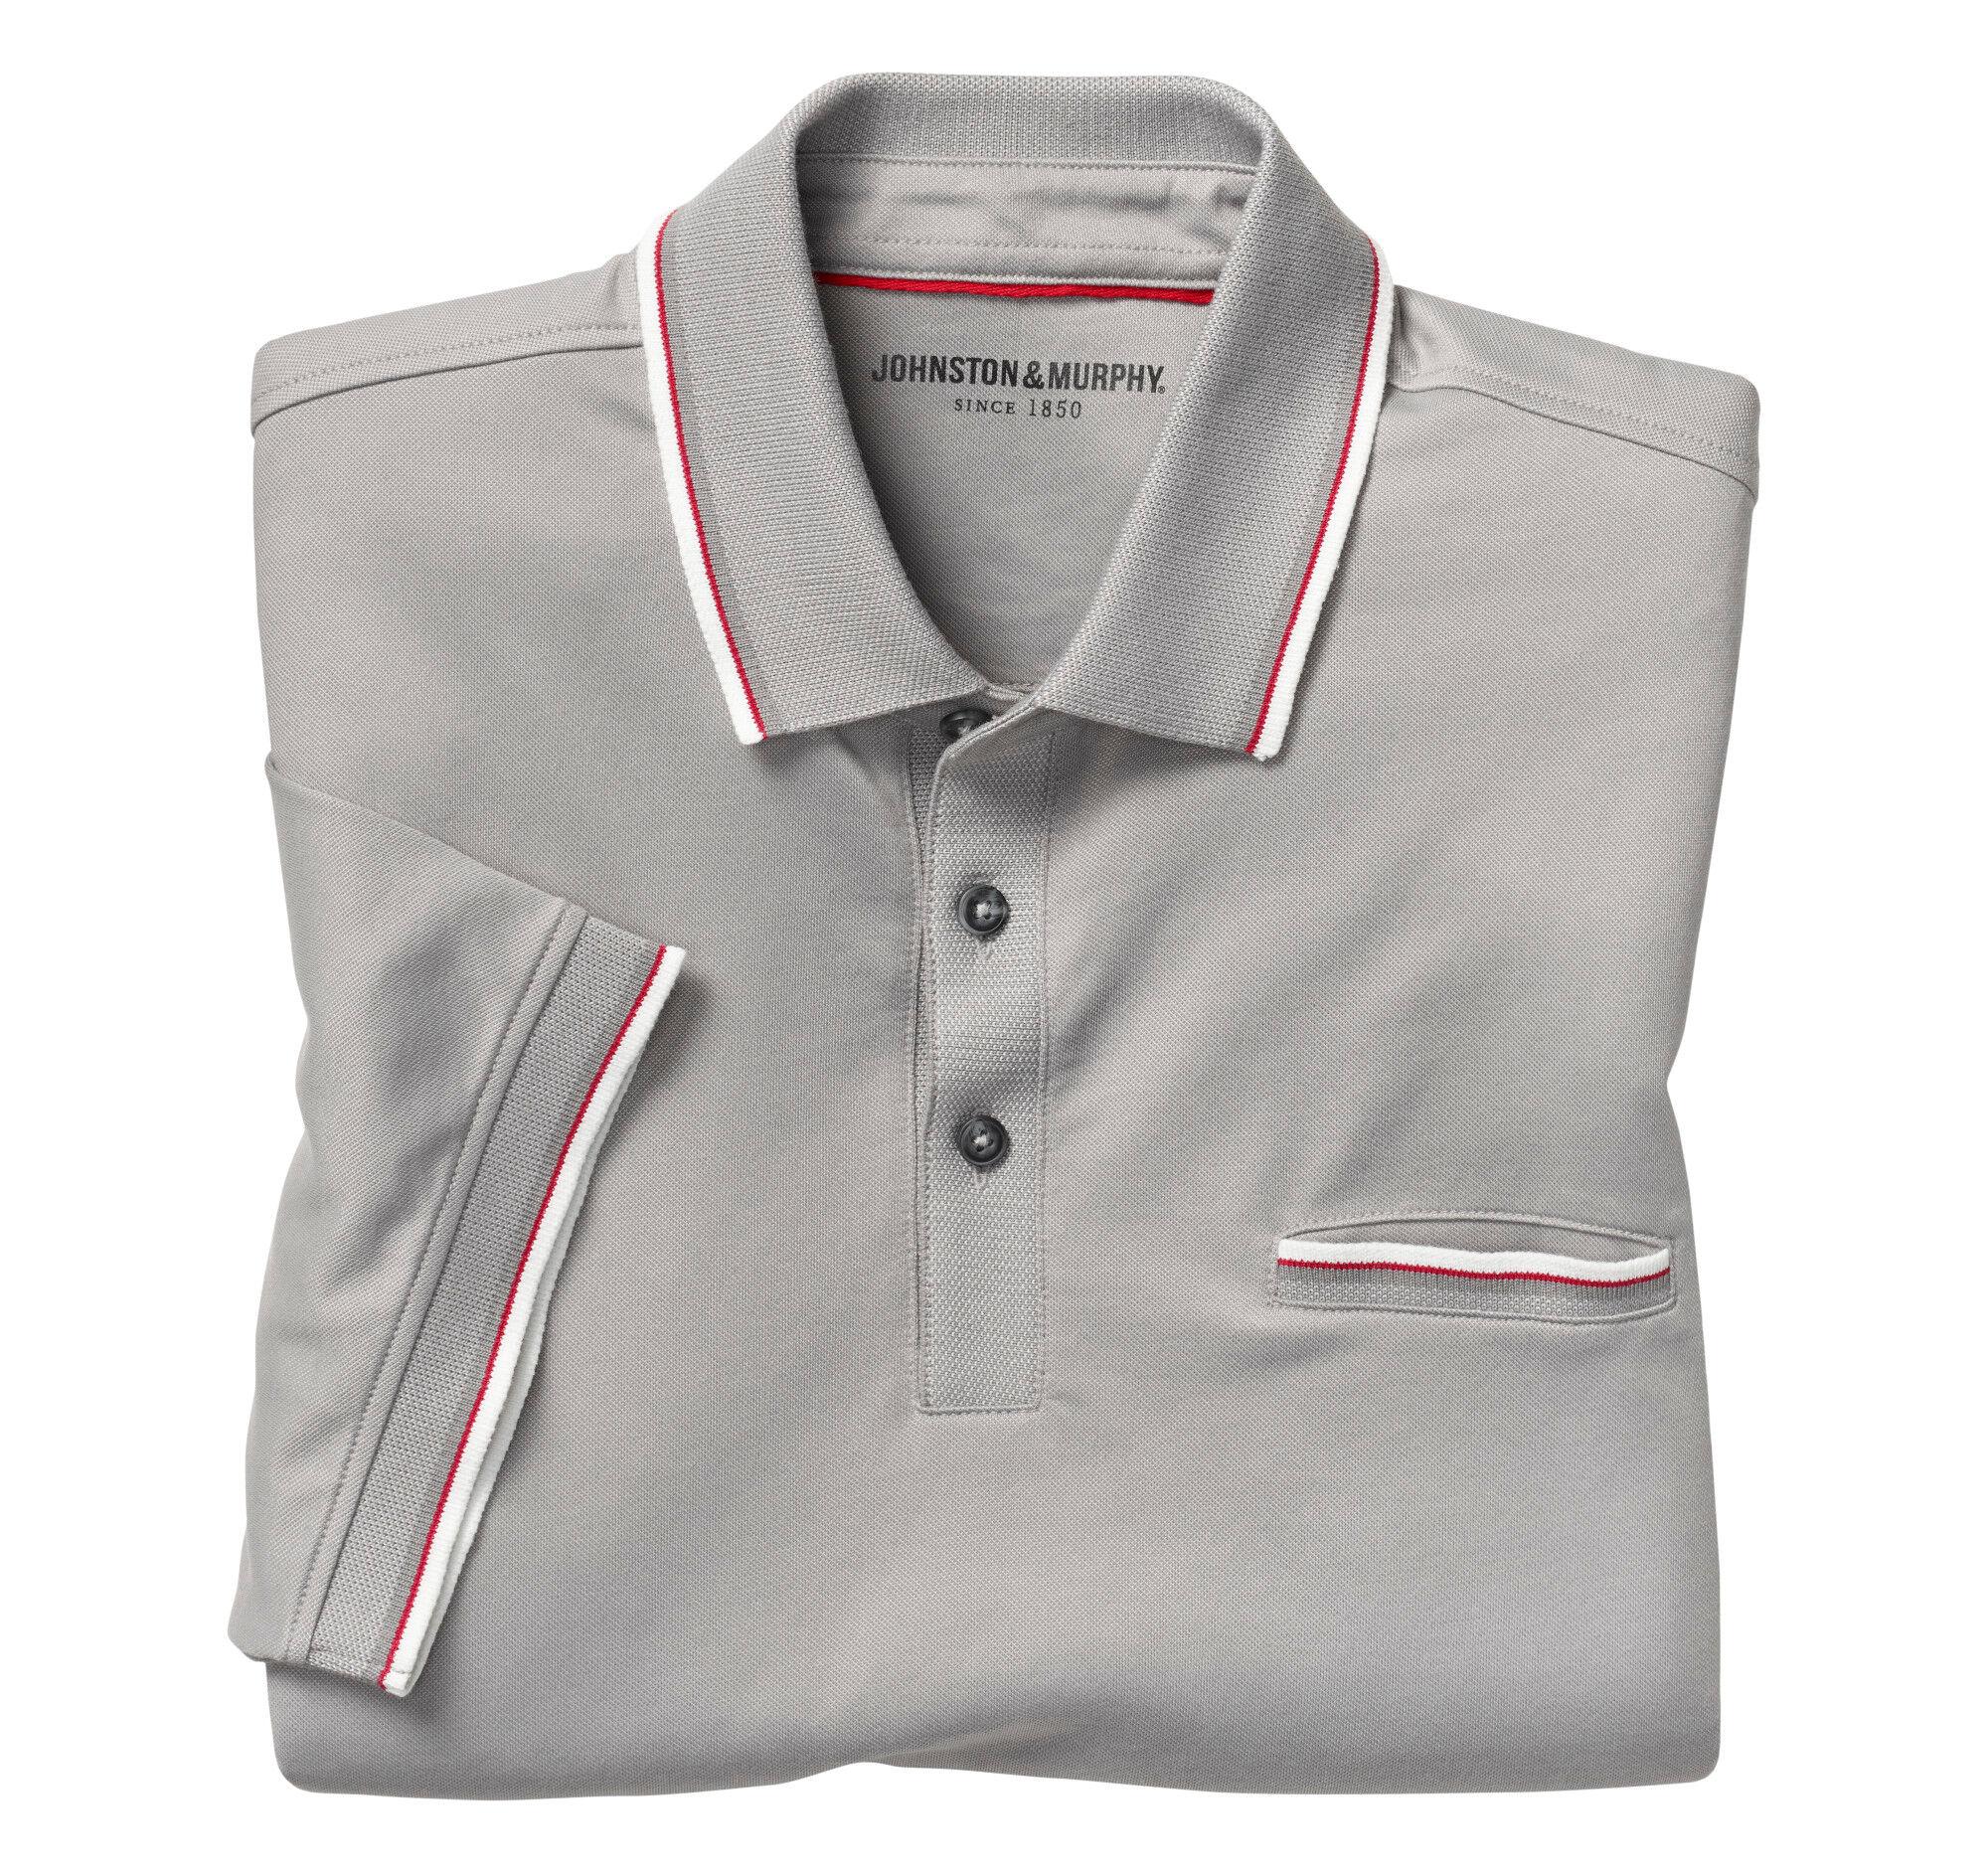 Johnston & Murphy Men's Sport Polo - Charcoal - Size XL